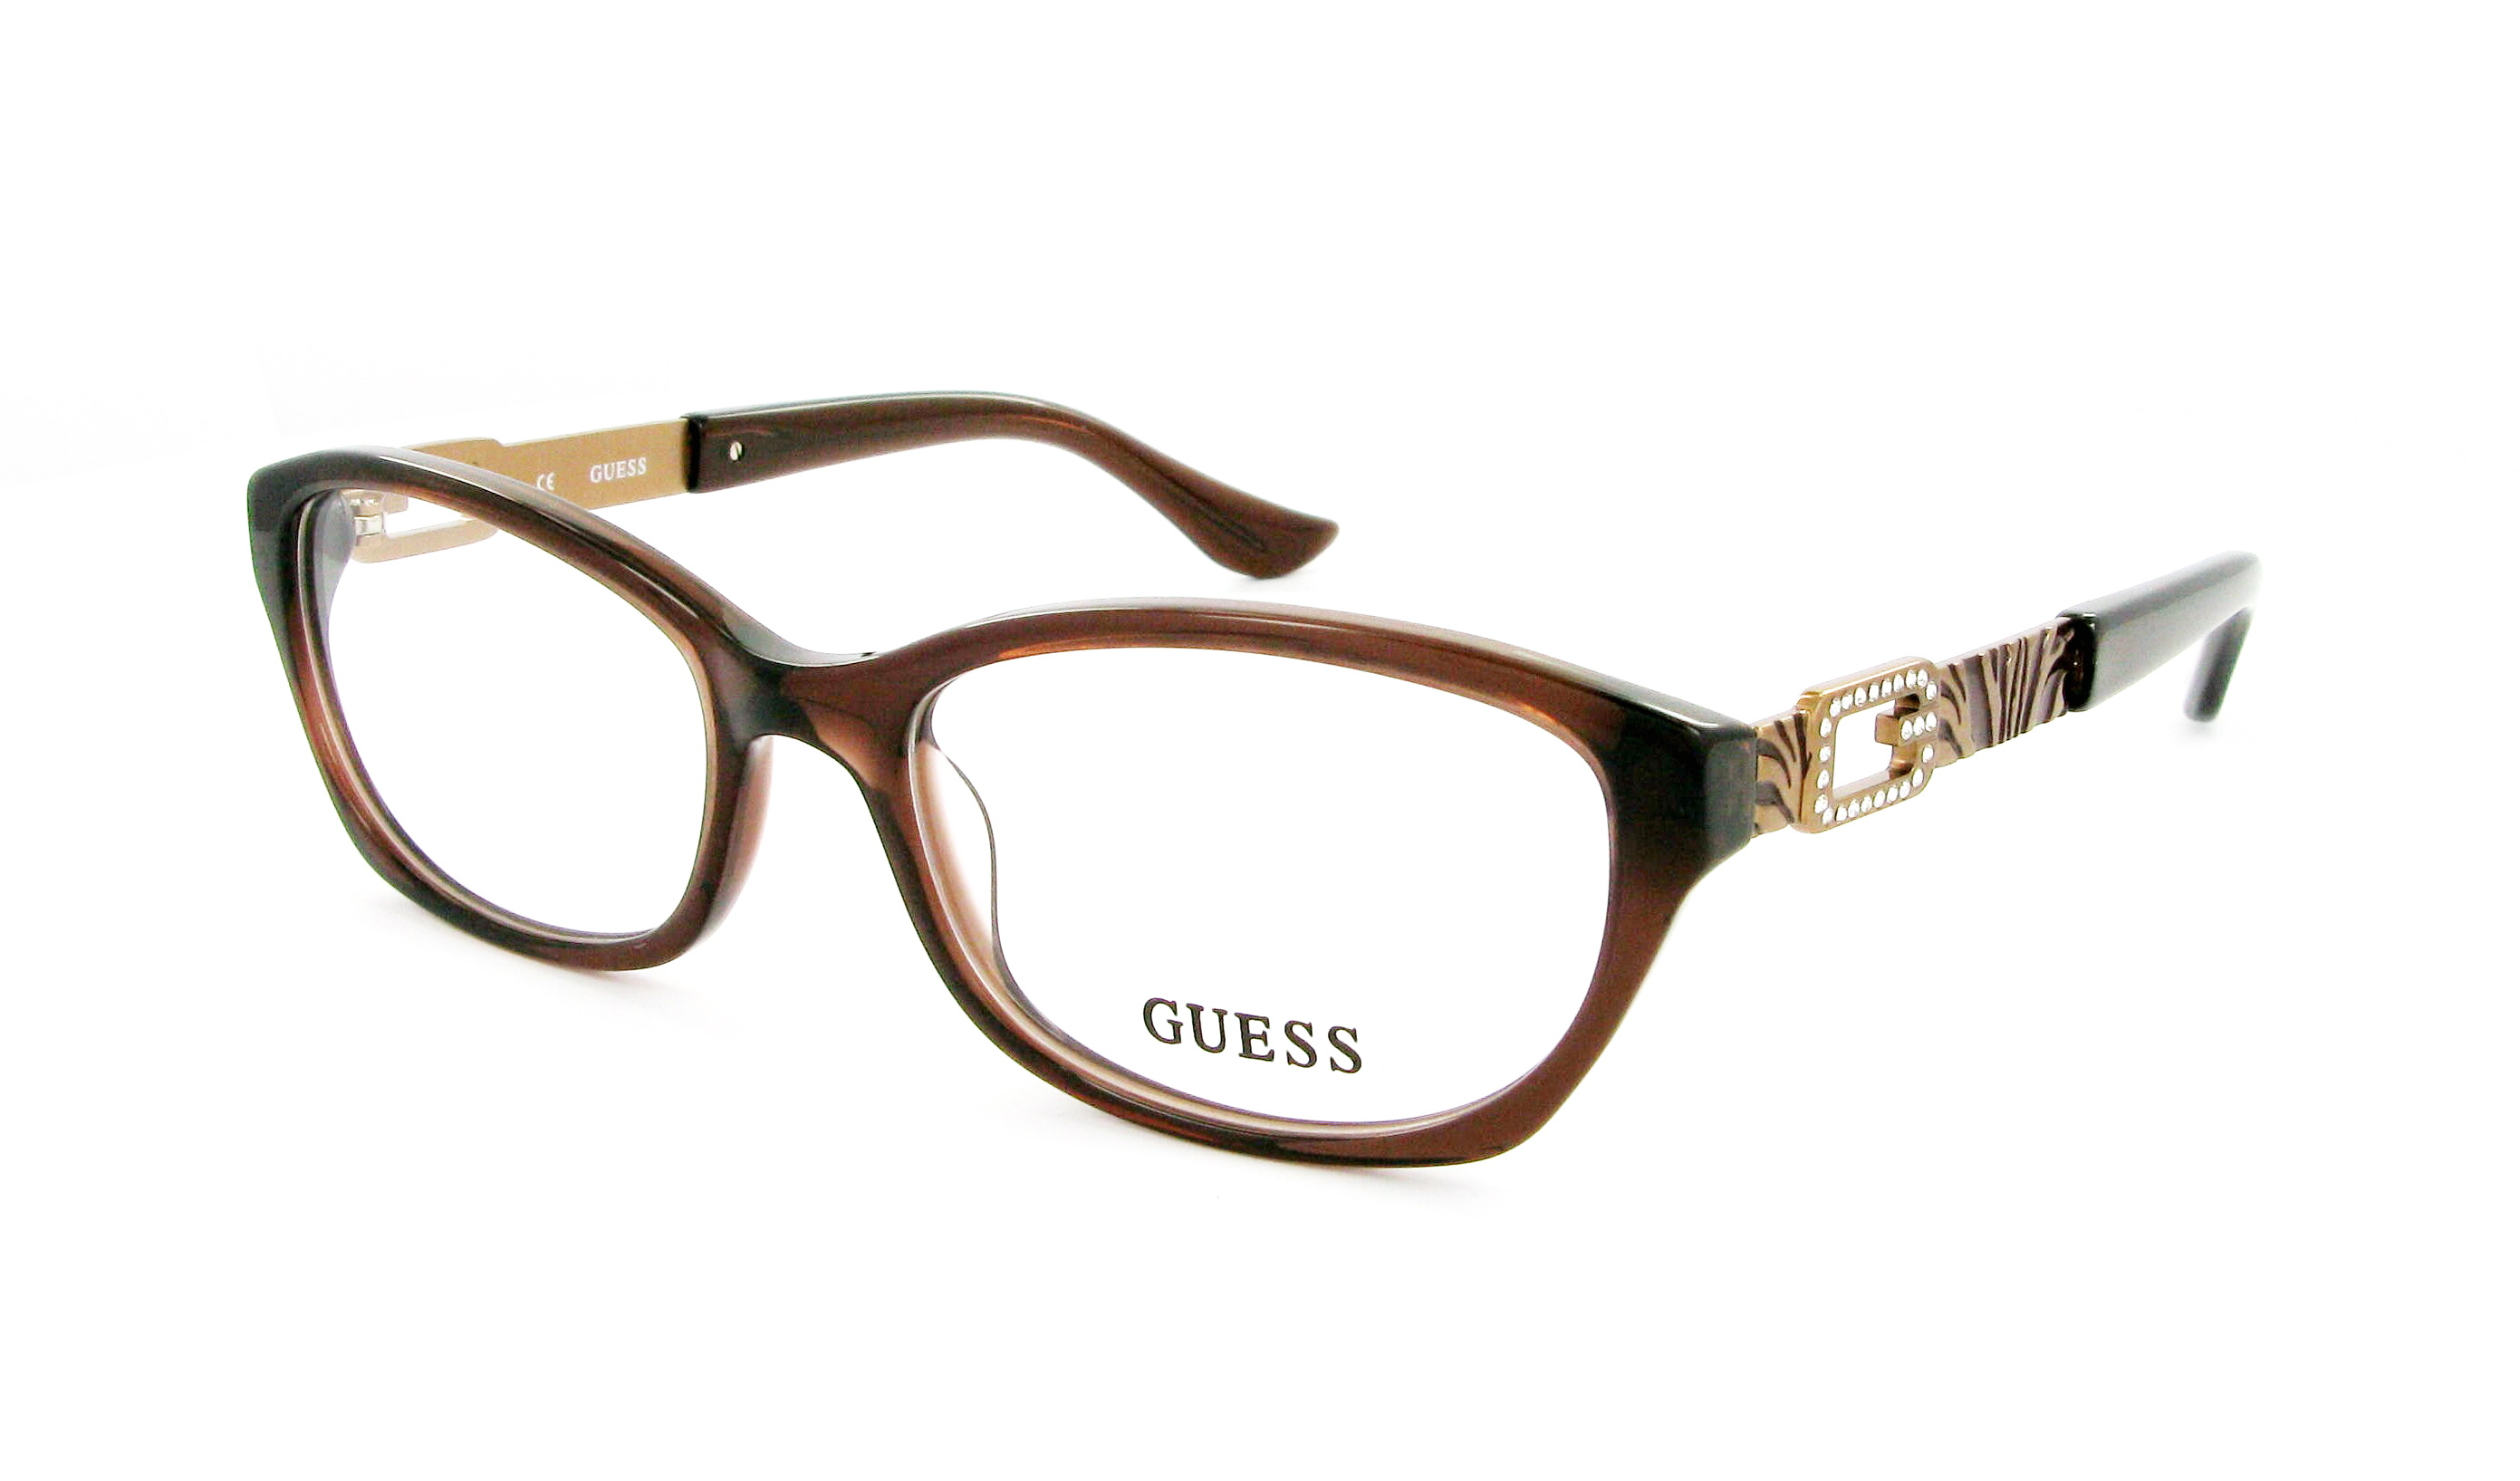 lunettes de vue guess gu 2287 brn 52 17 femme brun ovale cercl e tendance 52mmx17mm 117. Black Bedroom Furniture Sets. Home Design Ideas